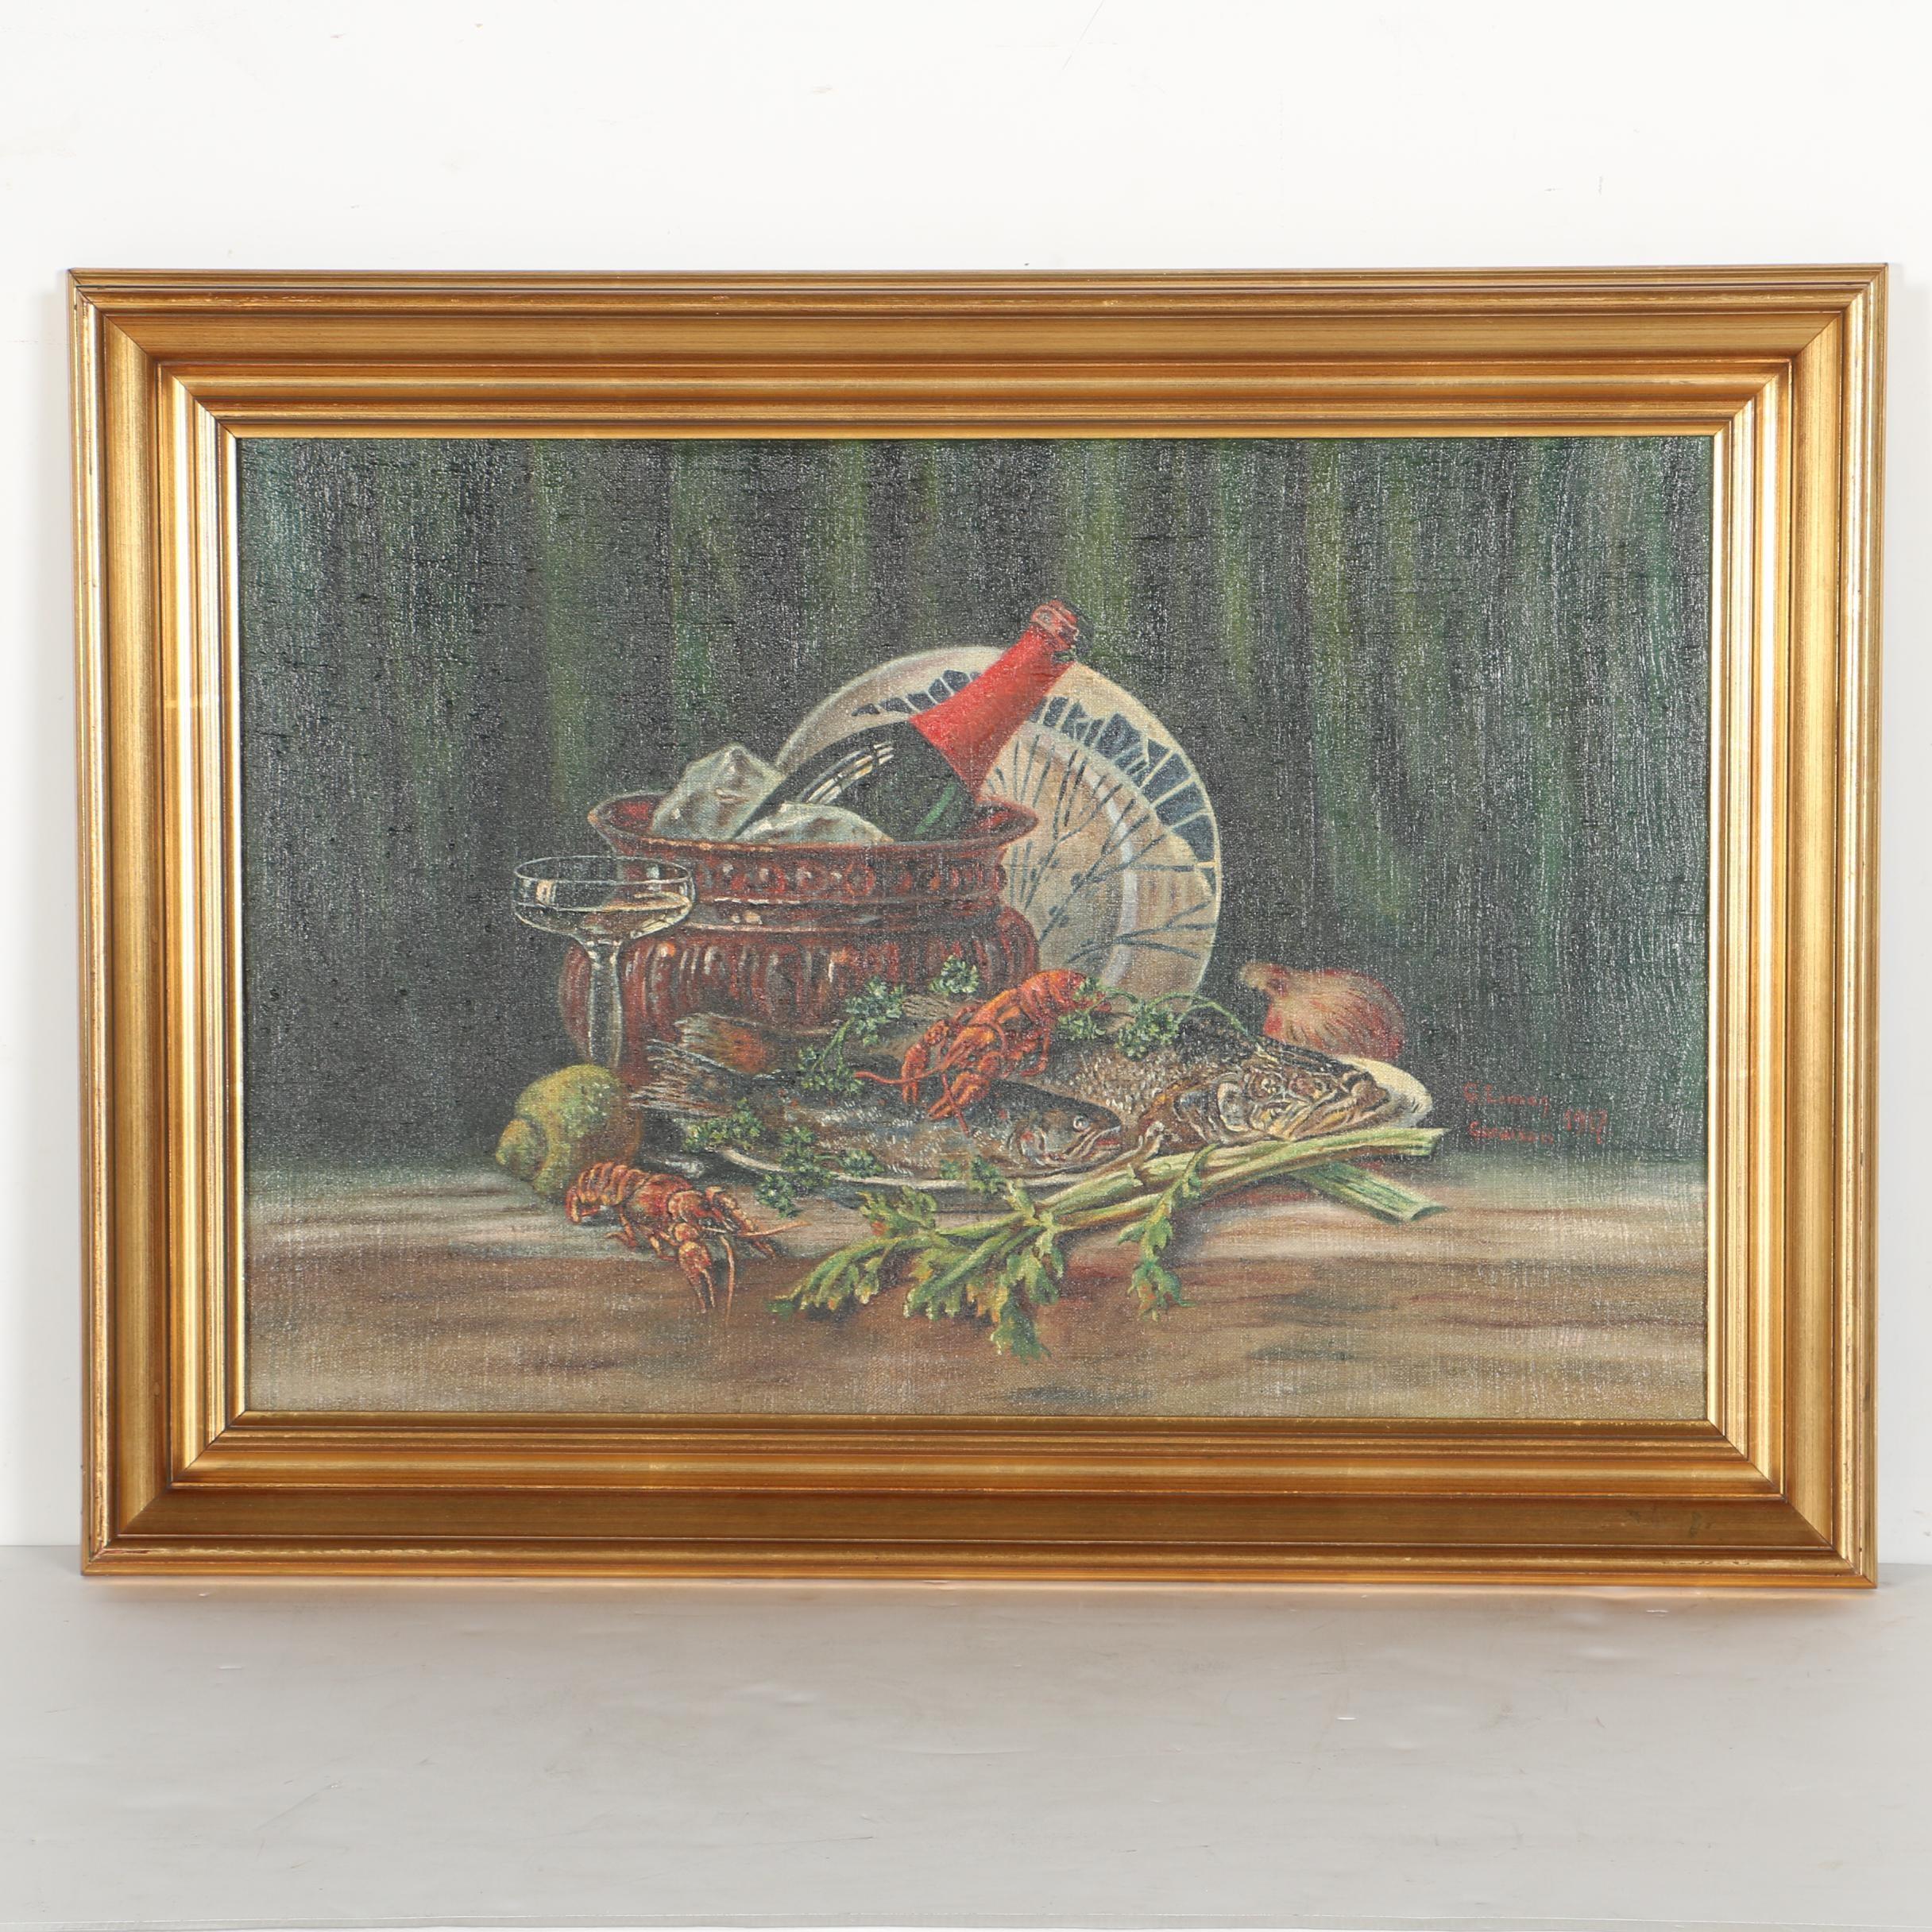 1917 G. Leman Garalson Oil on Canvas